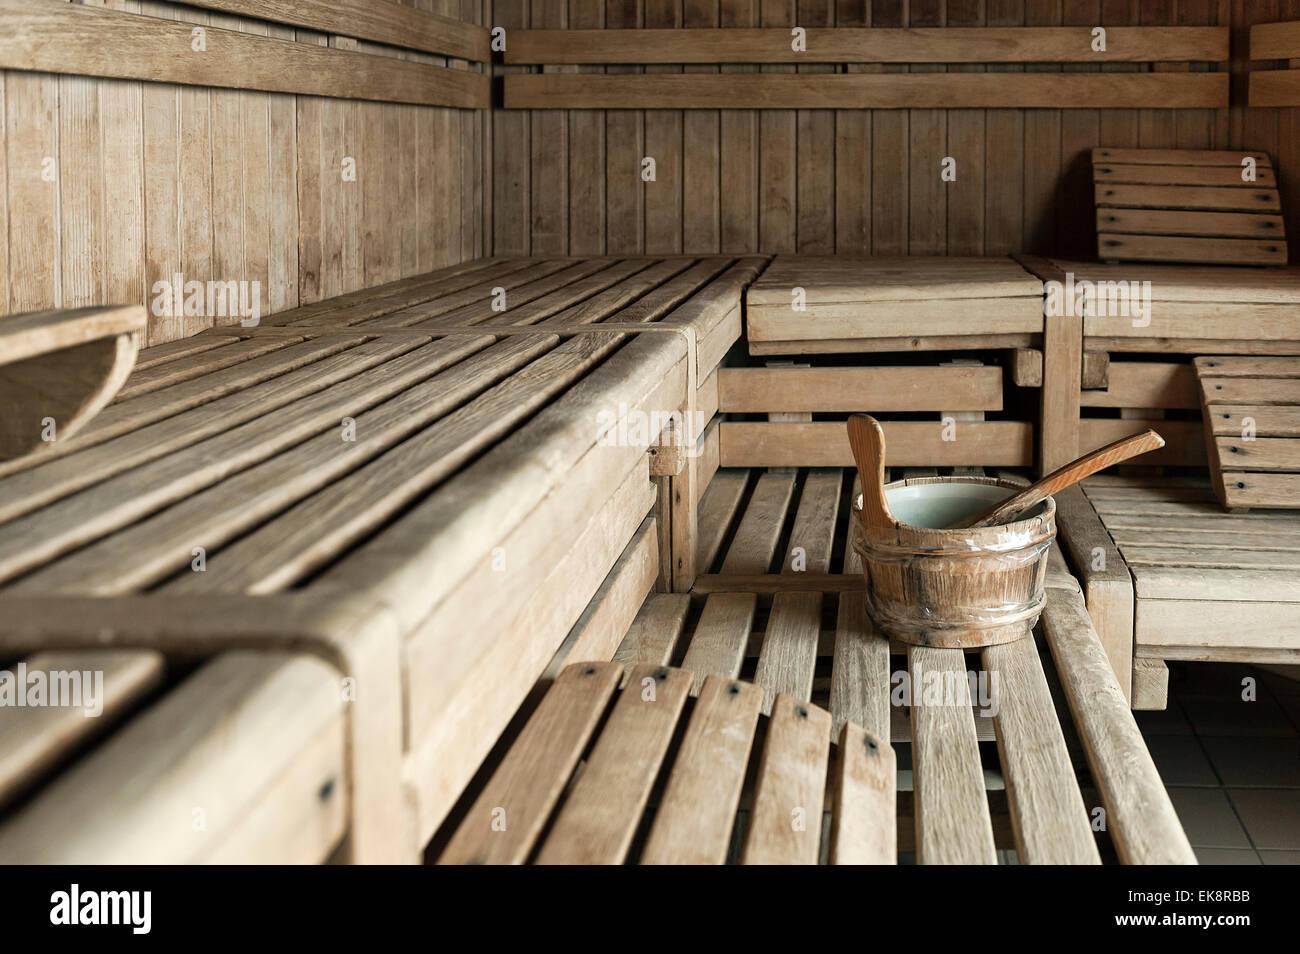 Spa wooden sauna interior with water bucket. - Stock Image